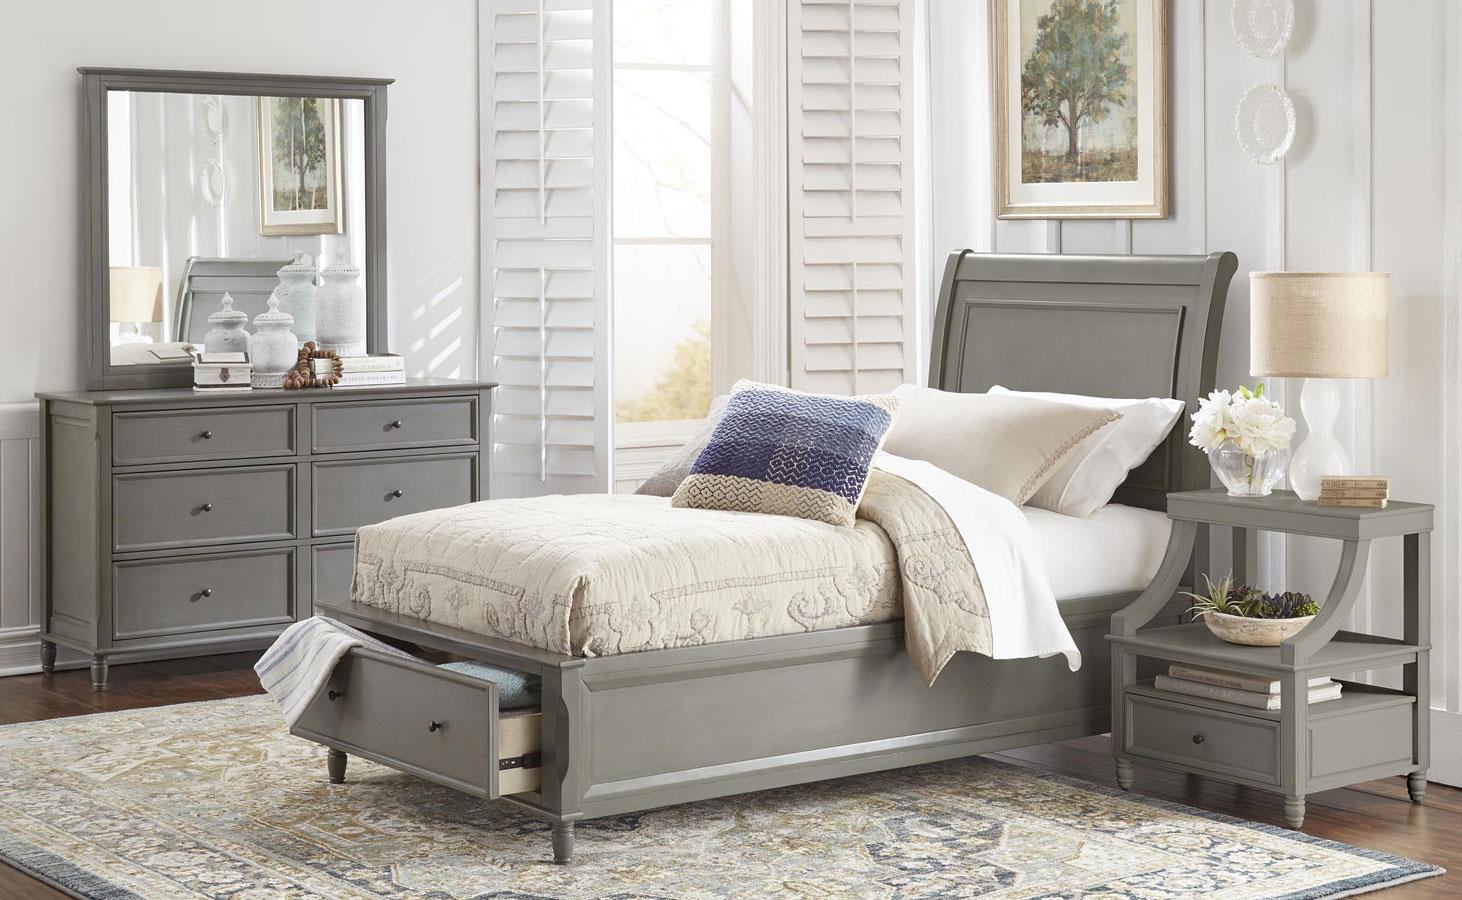 Avignon youth storage bedroom set grey jofran furniture - Youth bedroom furniture with storage ...